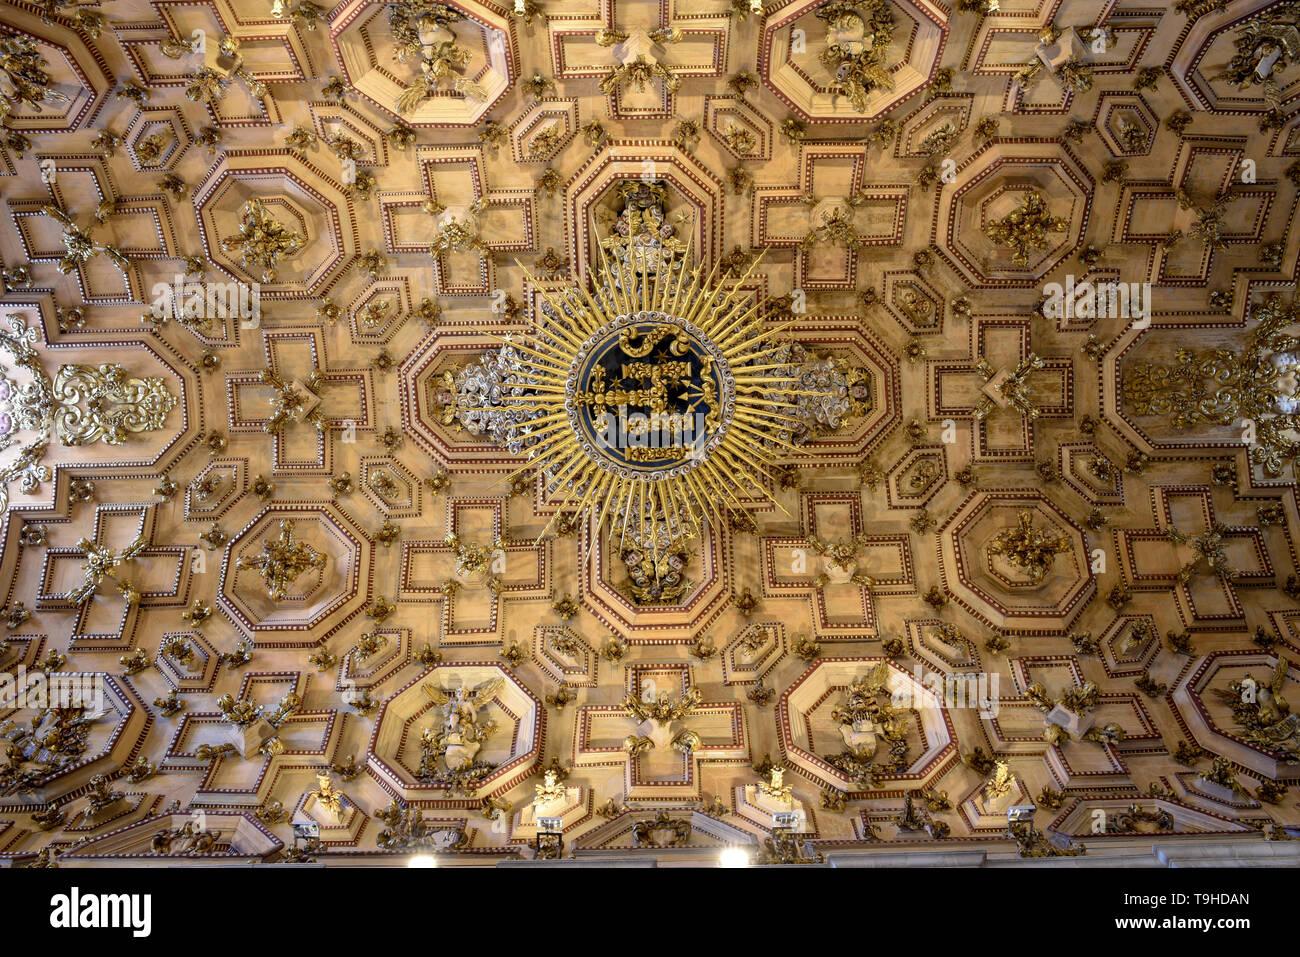 interior of the Cathedral Basilica of Salvador Bahia on Brazil - Stock Image